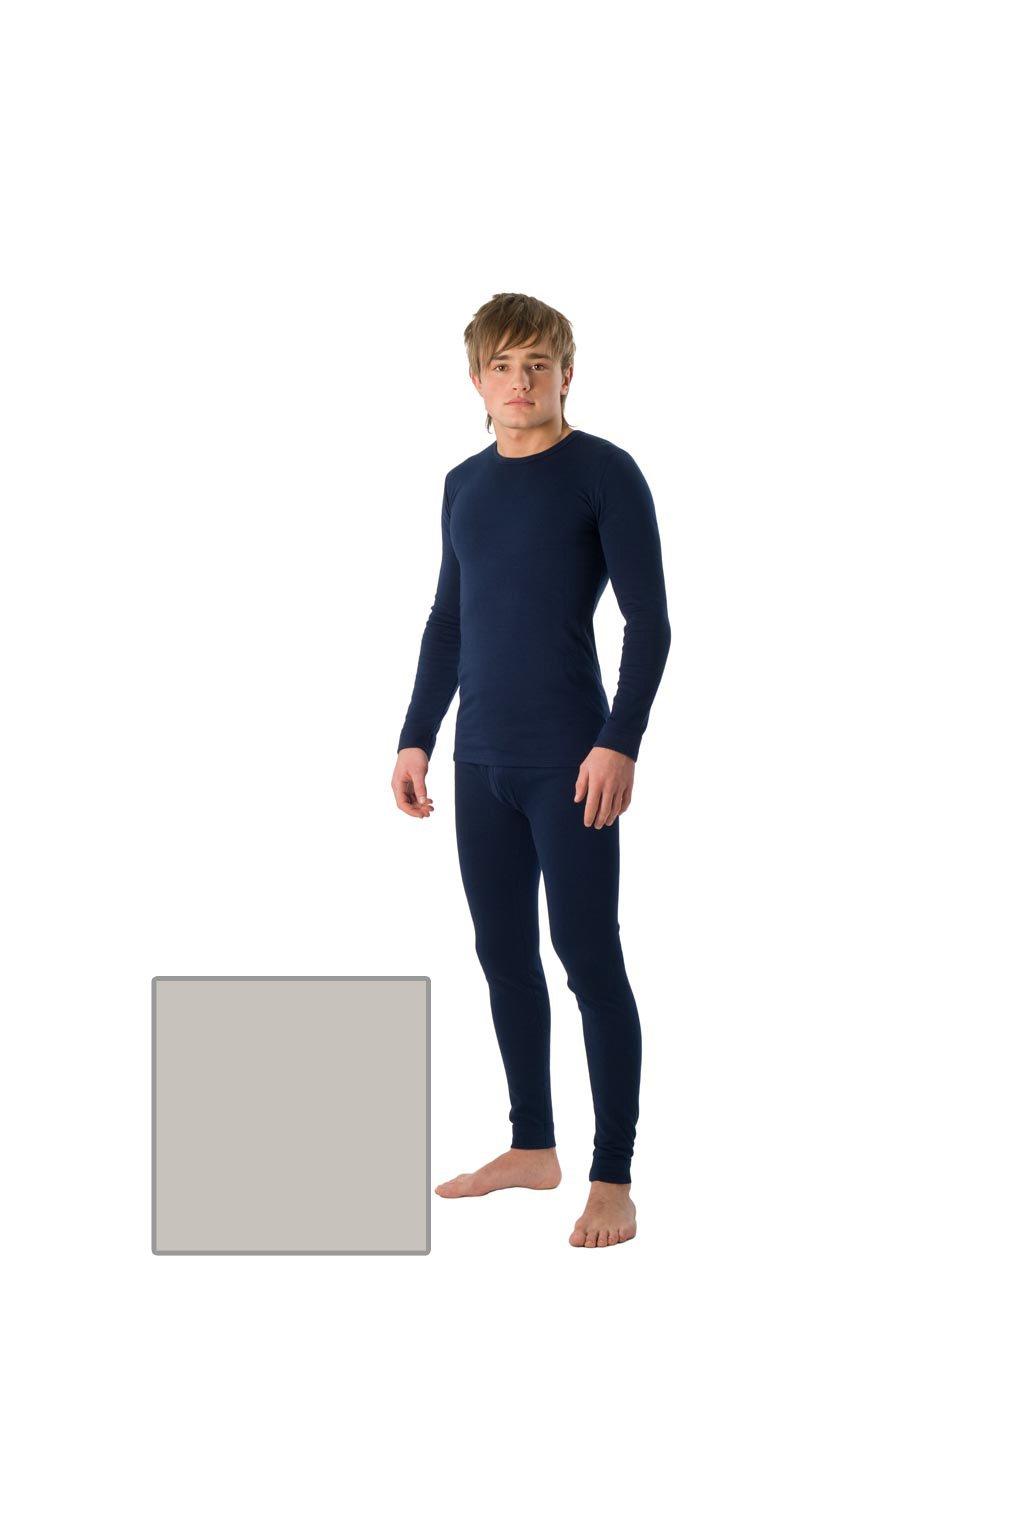 Chlapecké tričko s dlouhým rukávem YOUNG FASHION, 60202 30, šedá